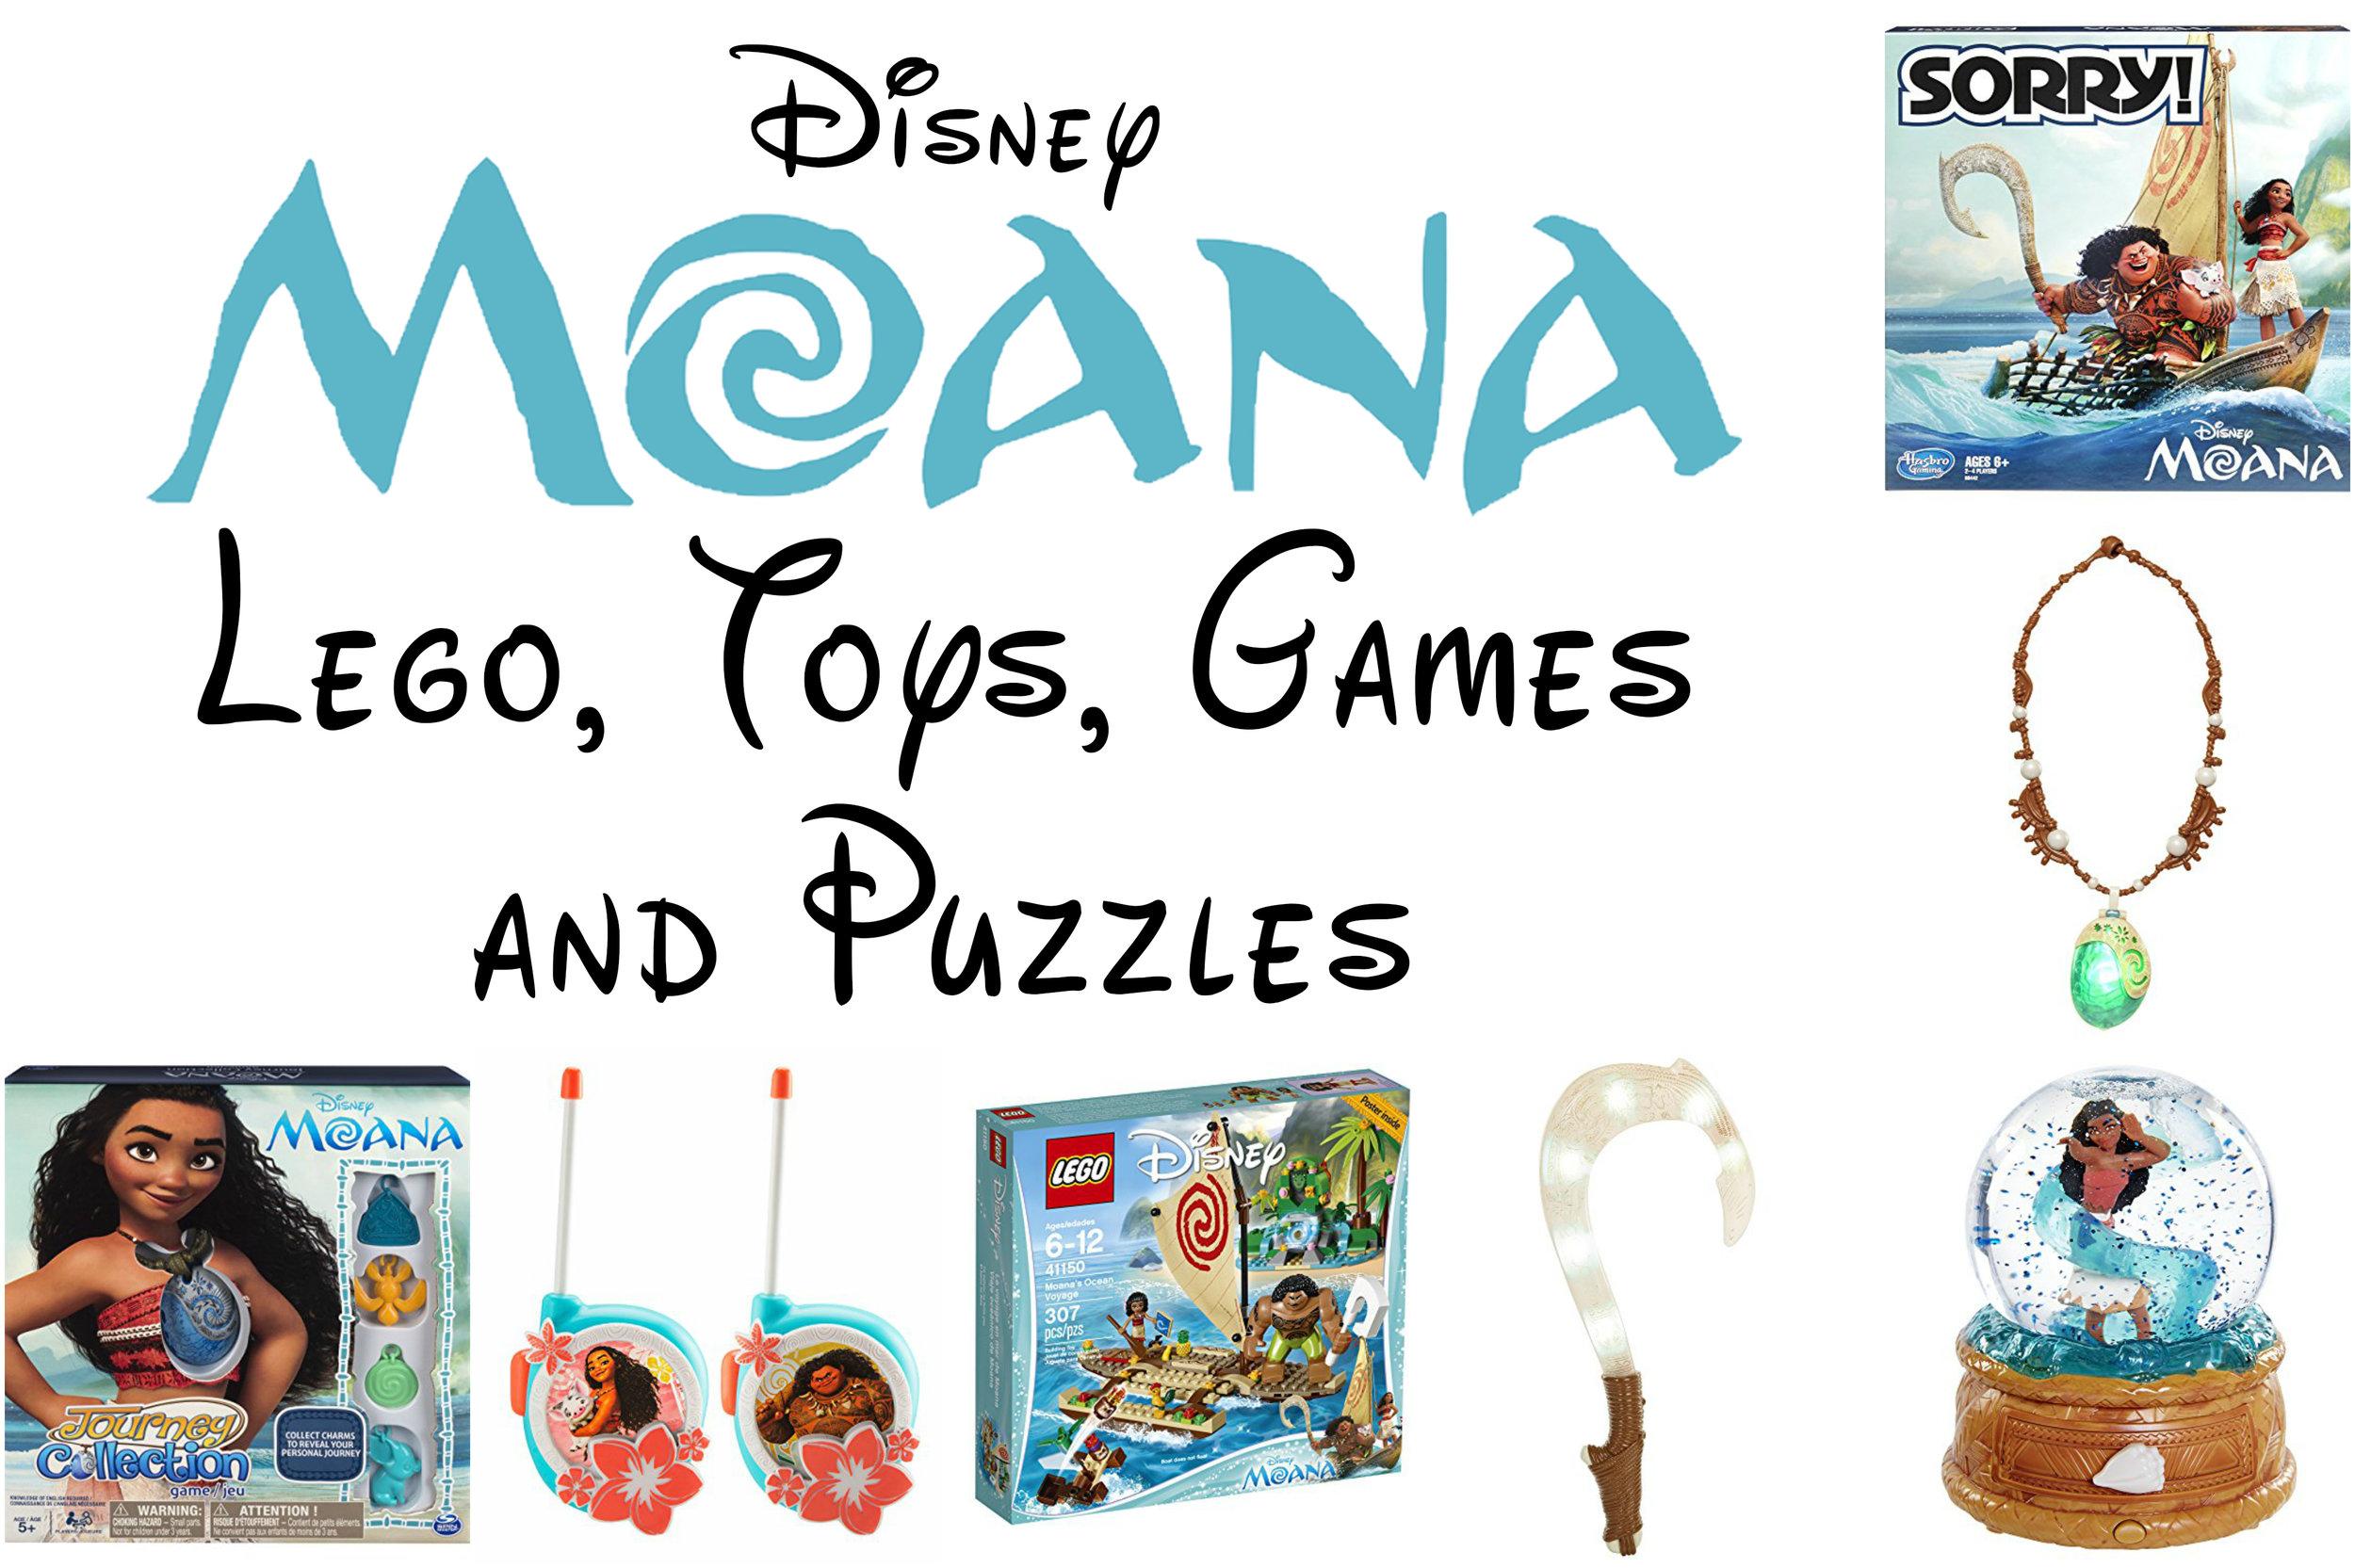 Disney Moana Lego, Toys and Games